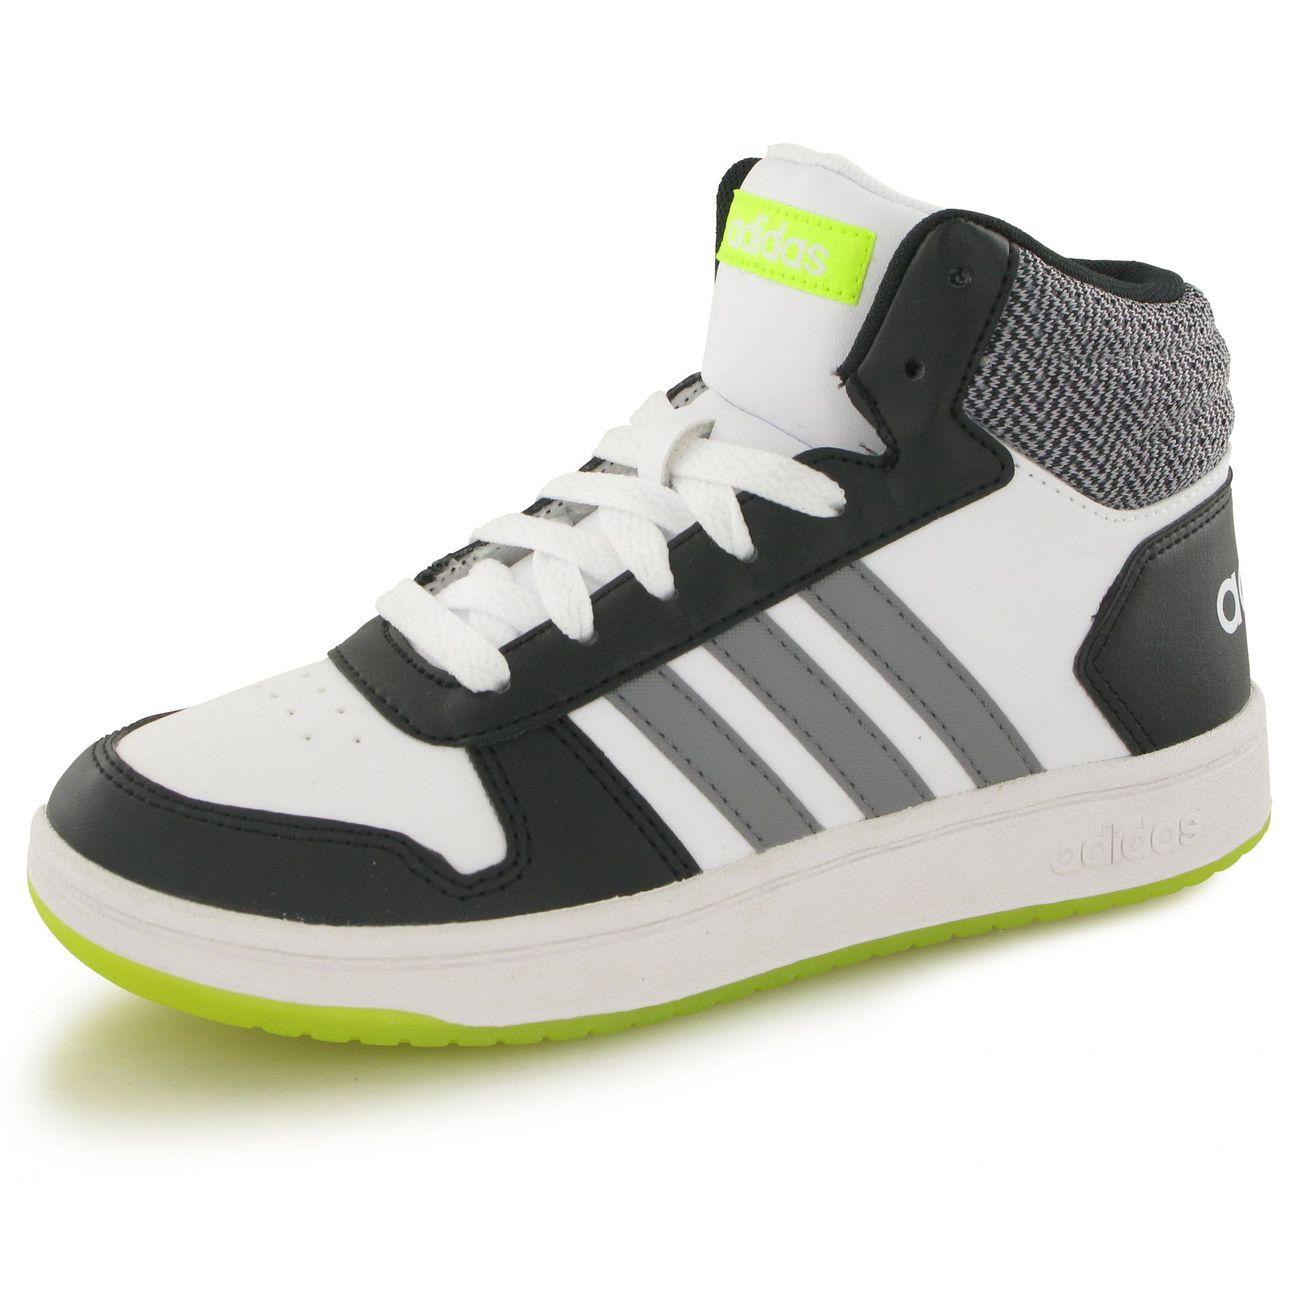 Adidas Hoops Mid 2.0 blanc, baskets mode enfant – achat et